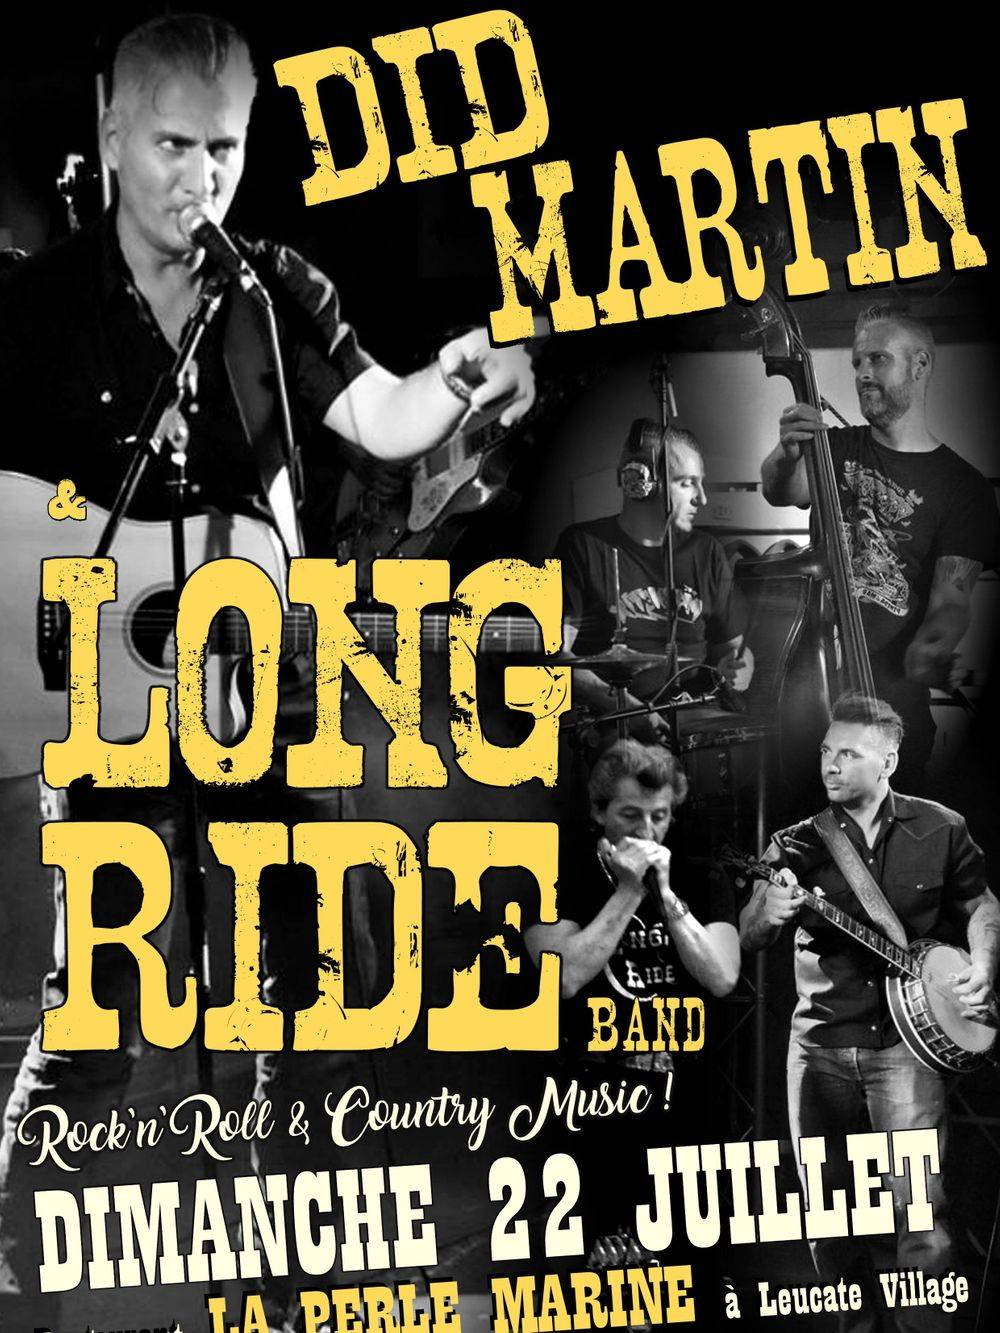 Did MARTIN & LONG RIDE BAND